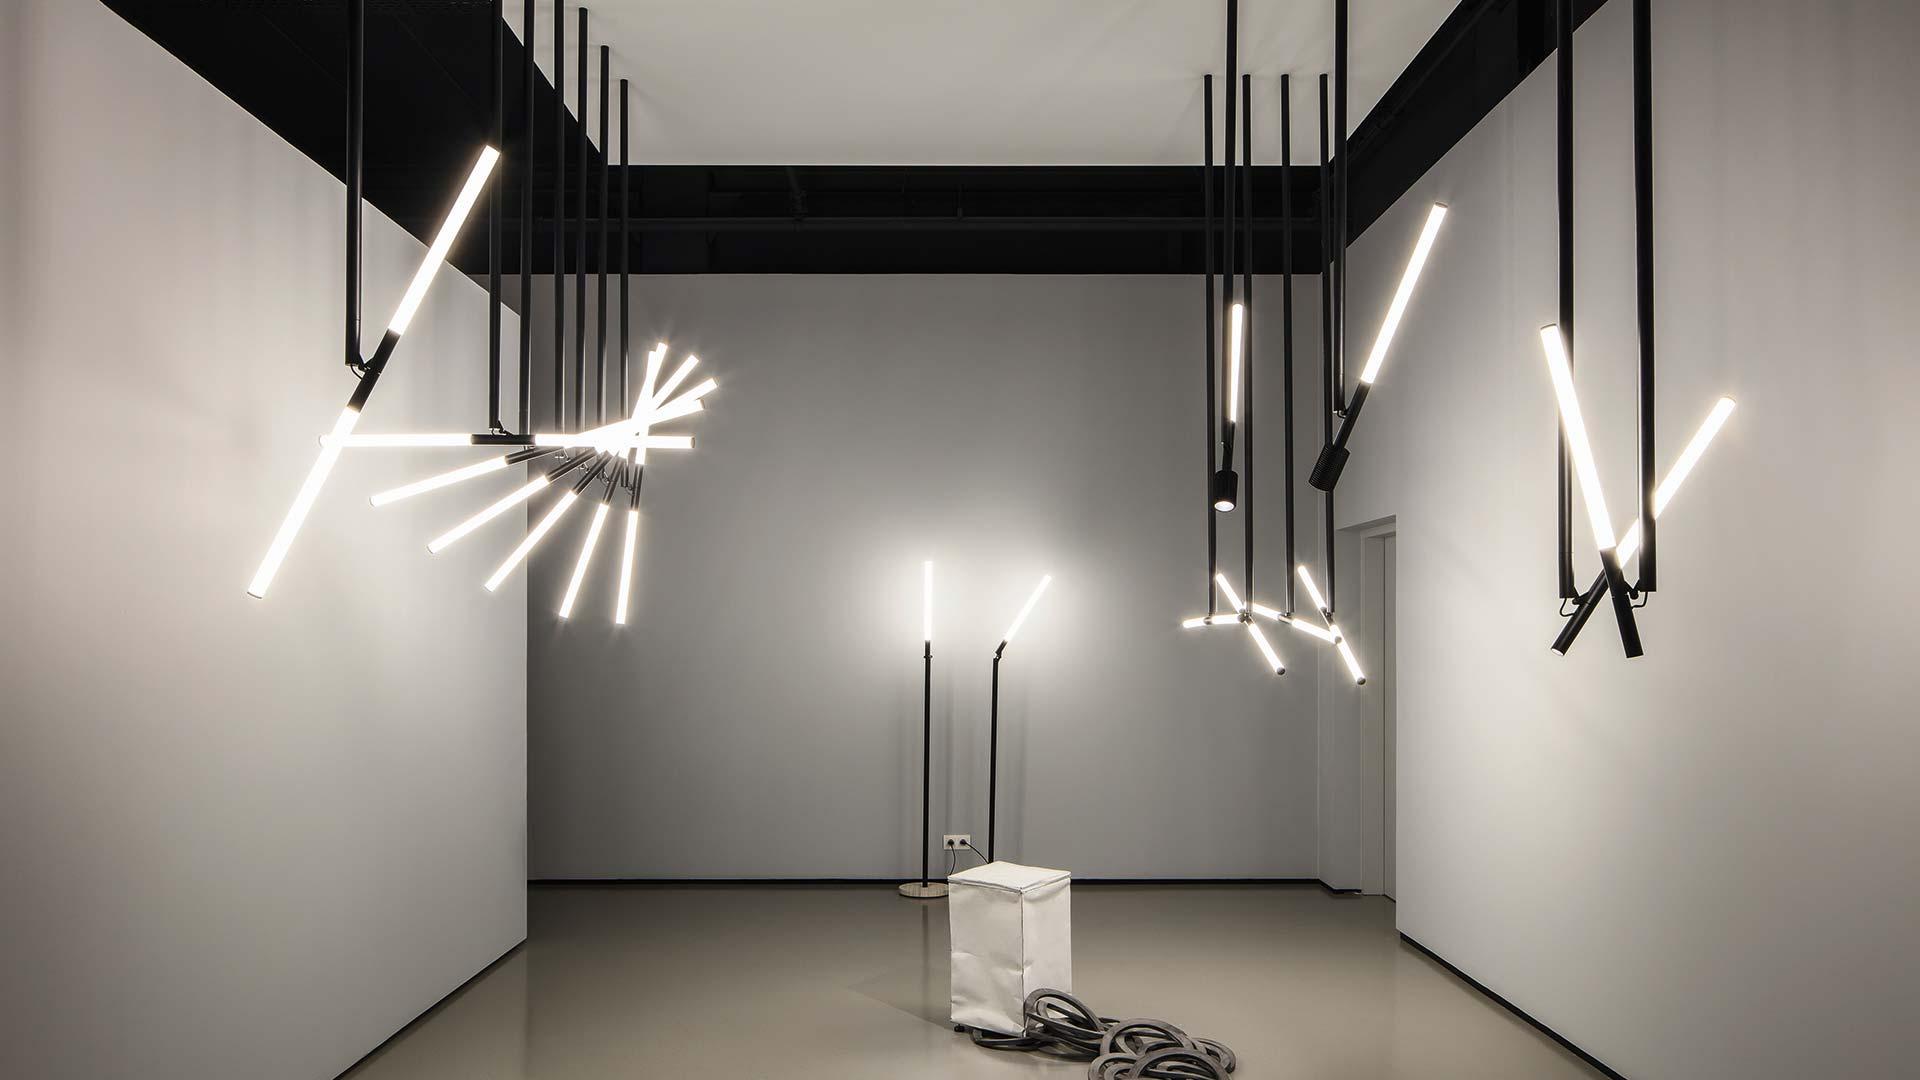 Lichtskulptur: Design-LED-Pendelleuchte Delta Light XY180 mit Montagestab, LED-Tubus und Spots. Design: OMA.